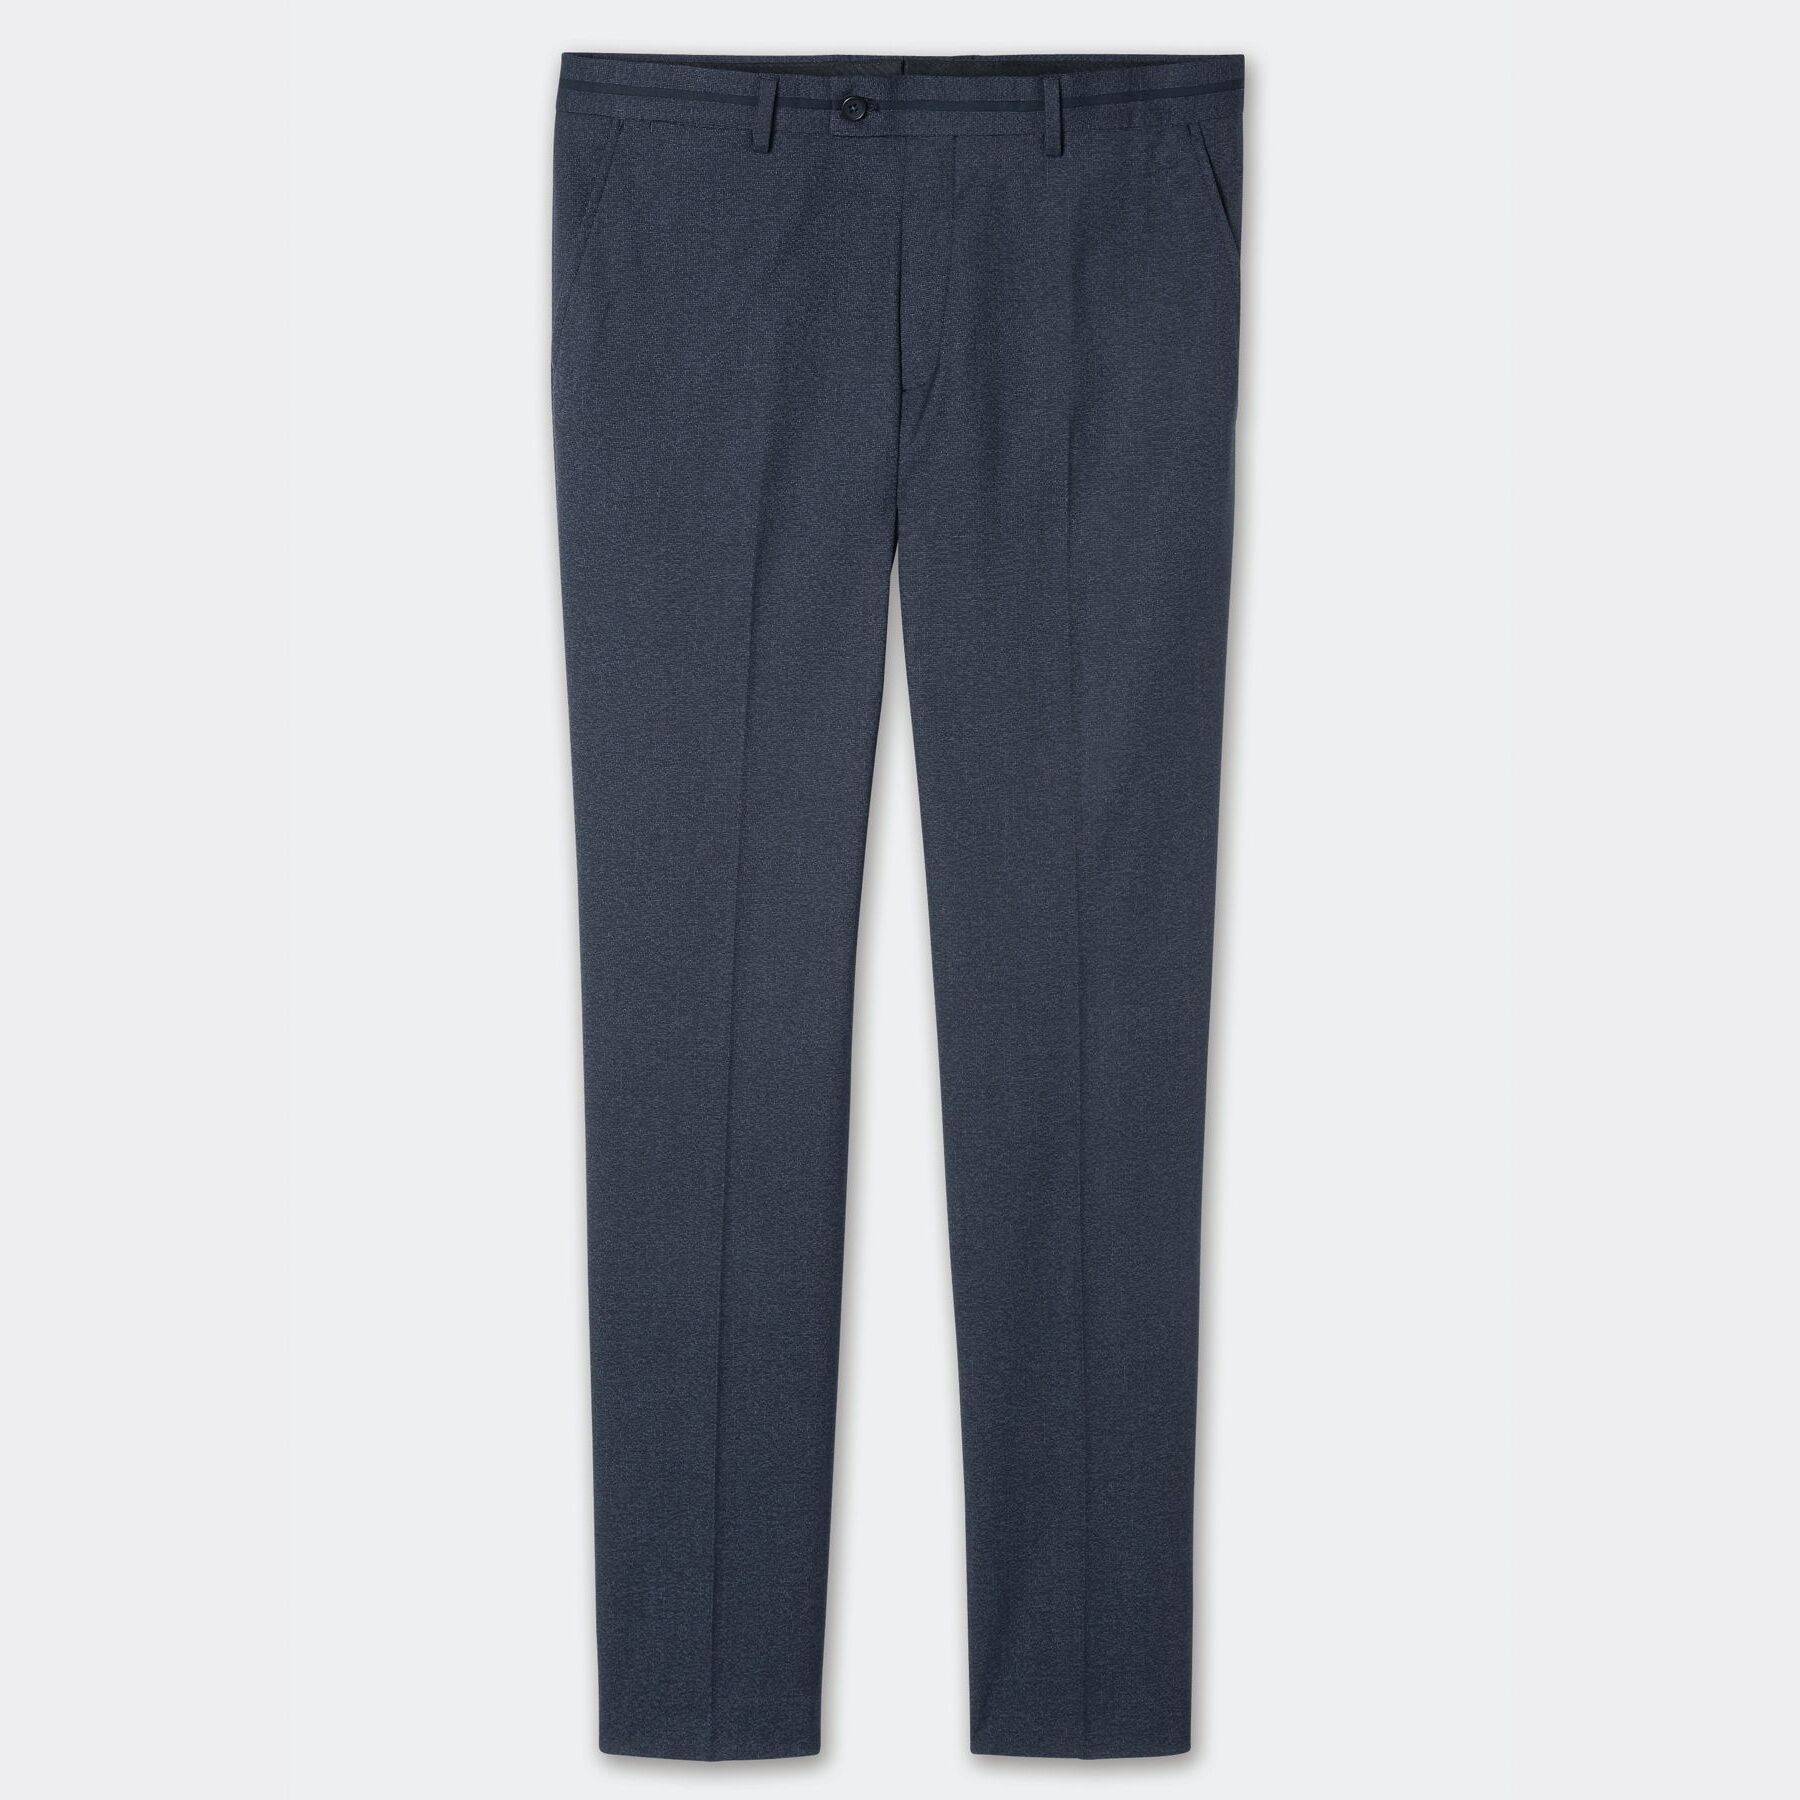 pantalon de costume bleu chin homme jules. Black Bedroom Furniture Sets. Home Design Ideas